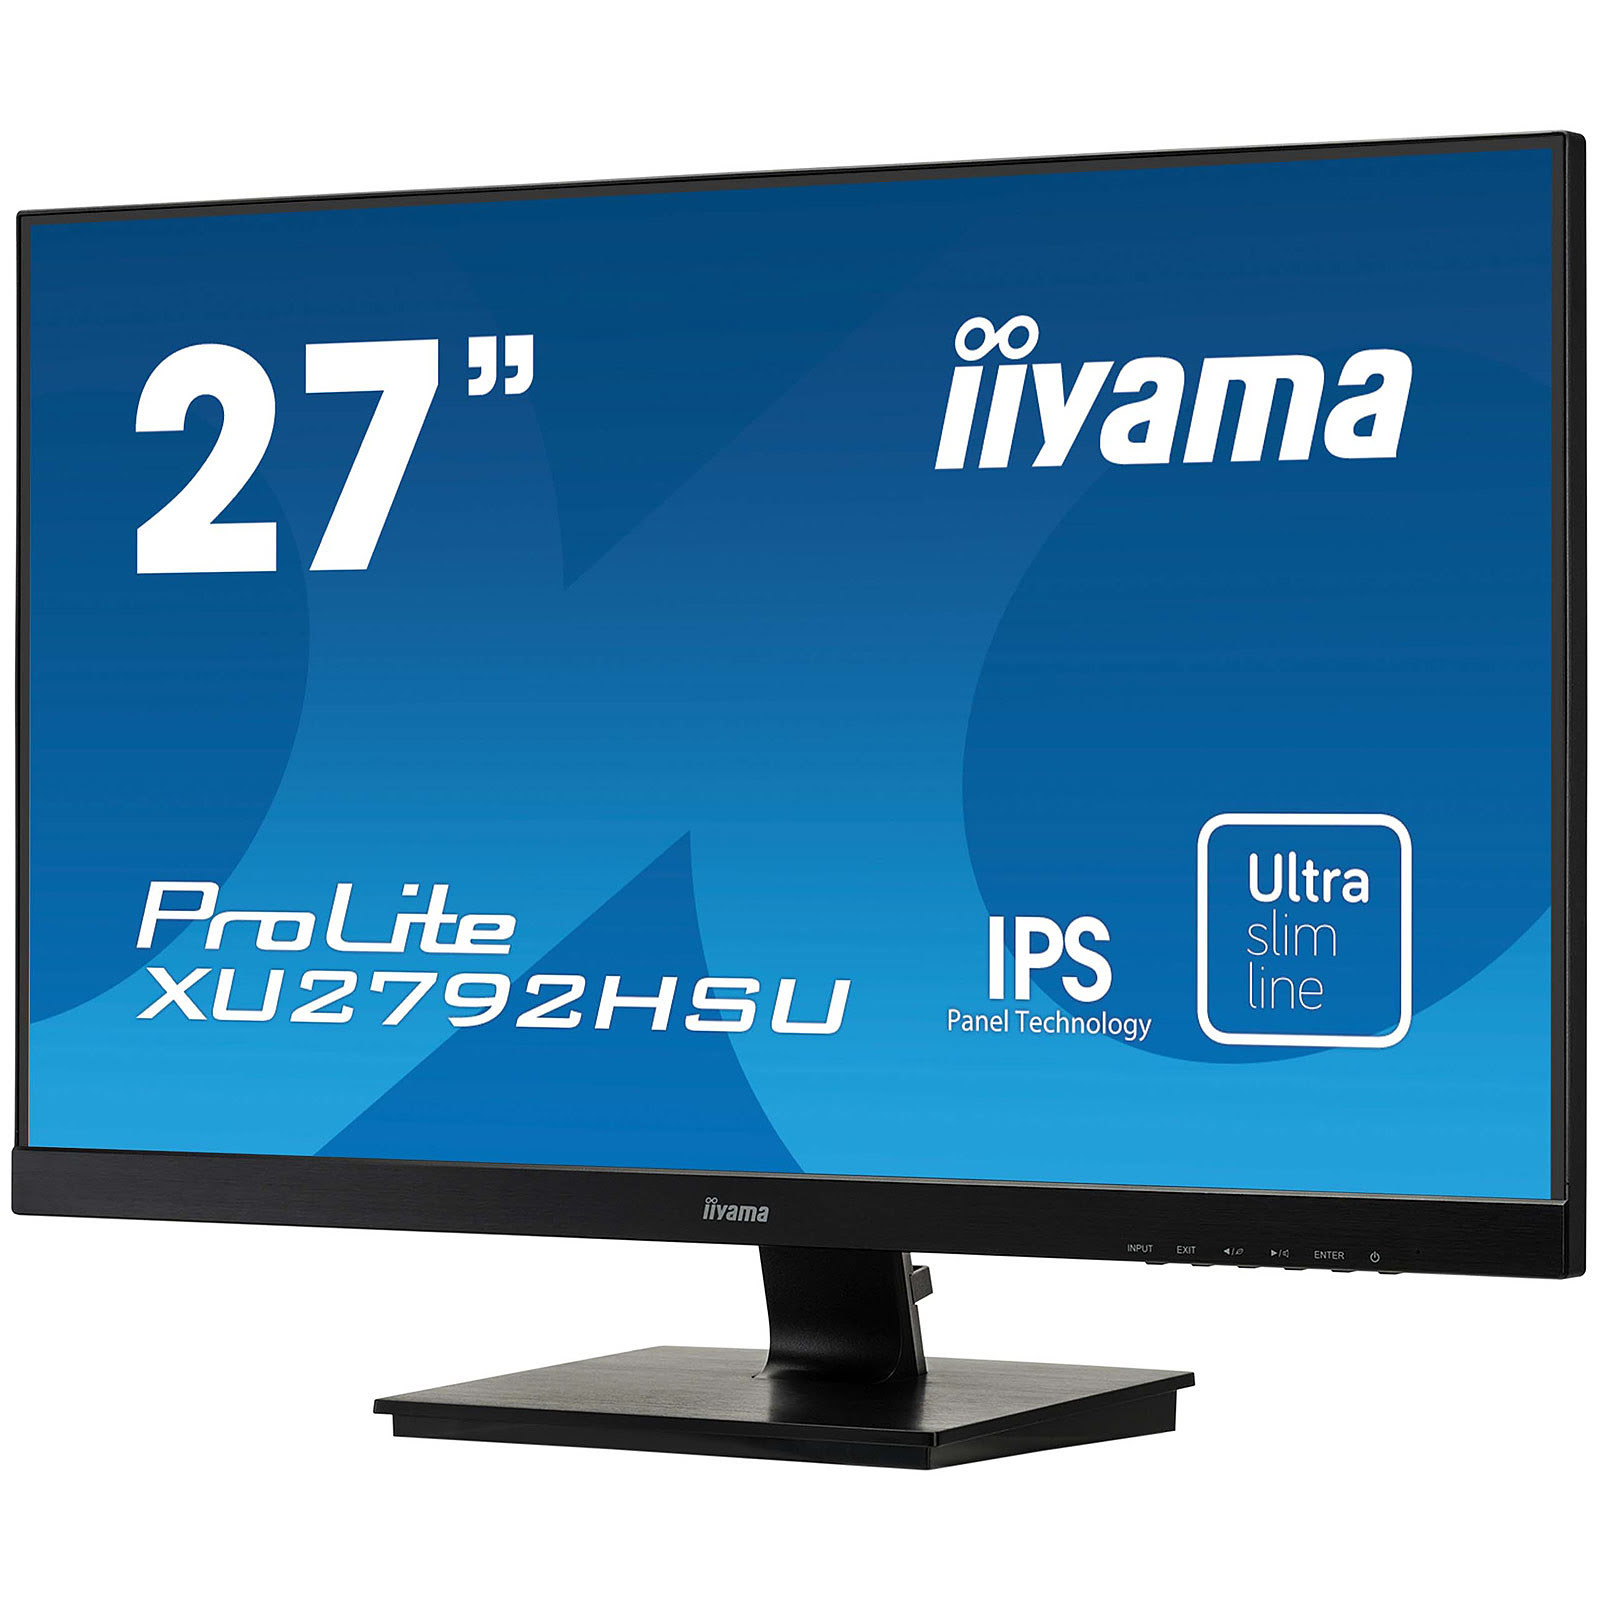 "Iiyama 27""  XU2792HSU-B1 - Ecran PC Iiyama - Cybertek.fr - 3"